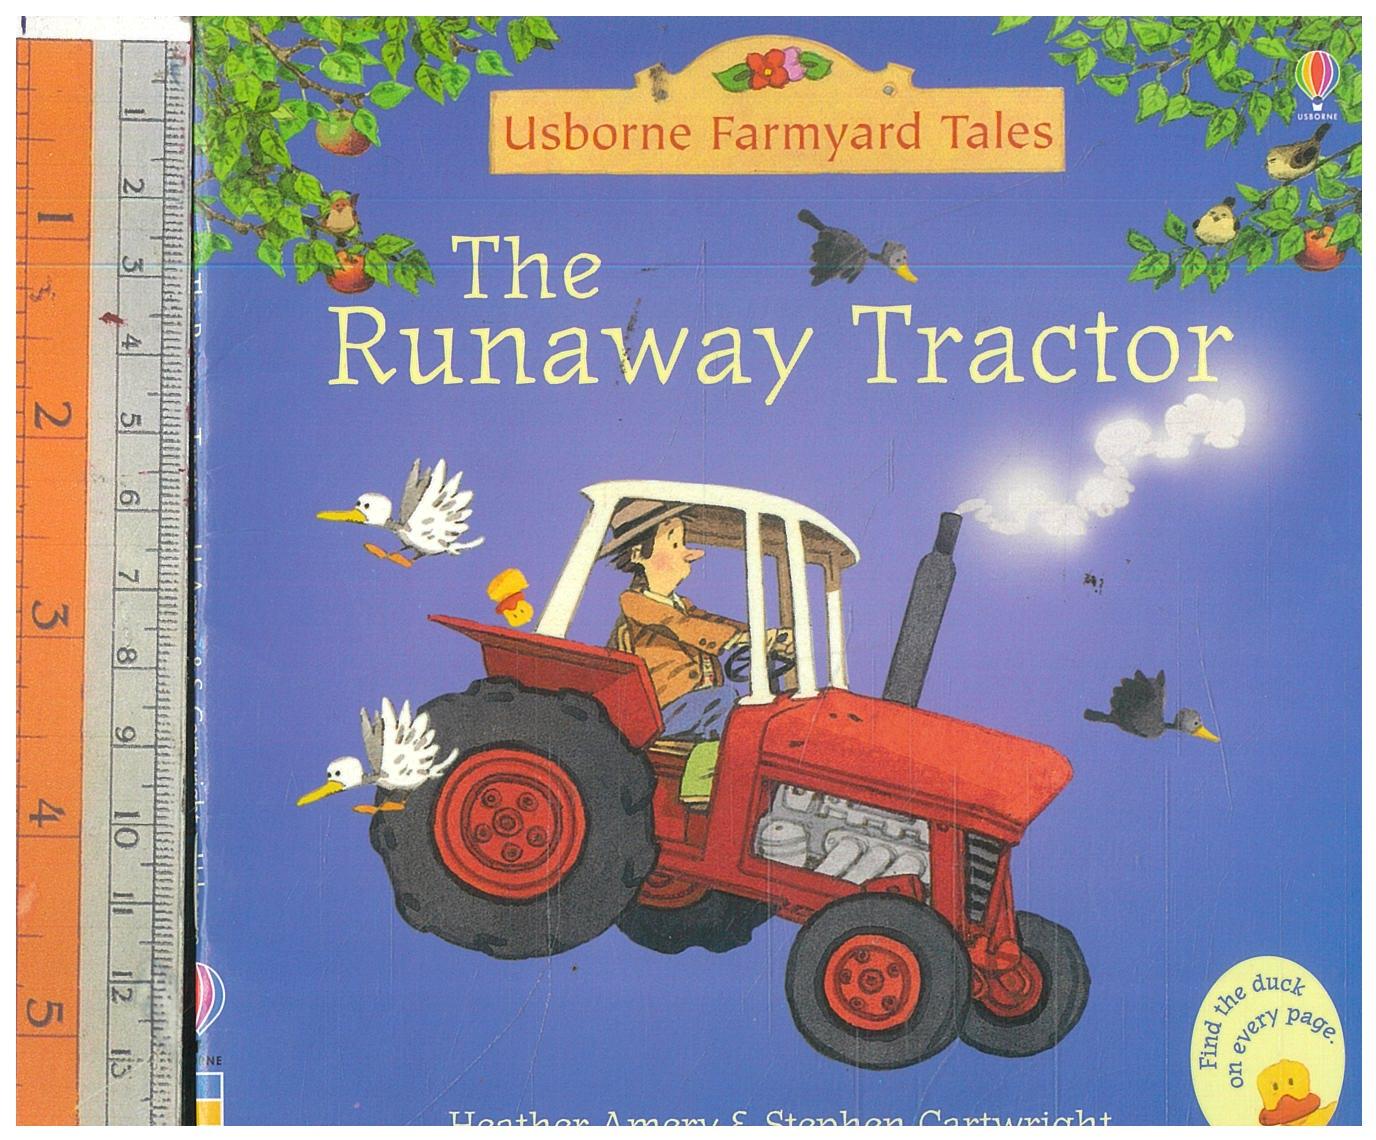 Runaway Tractor